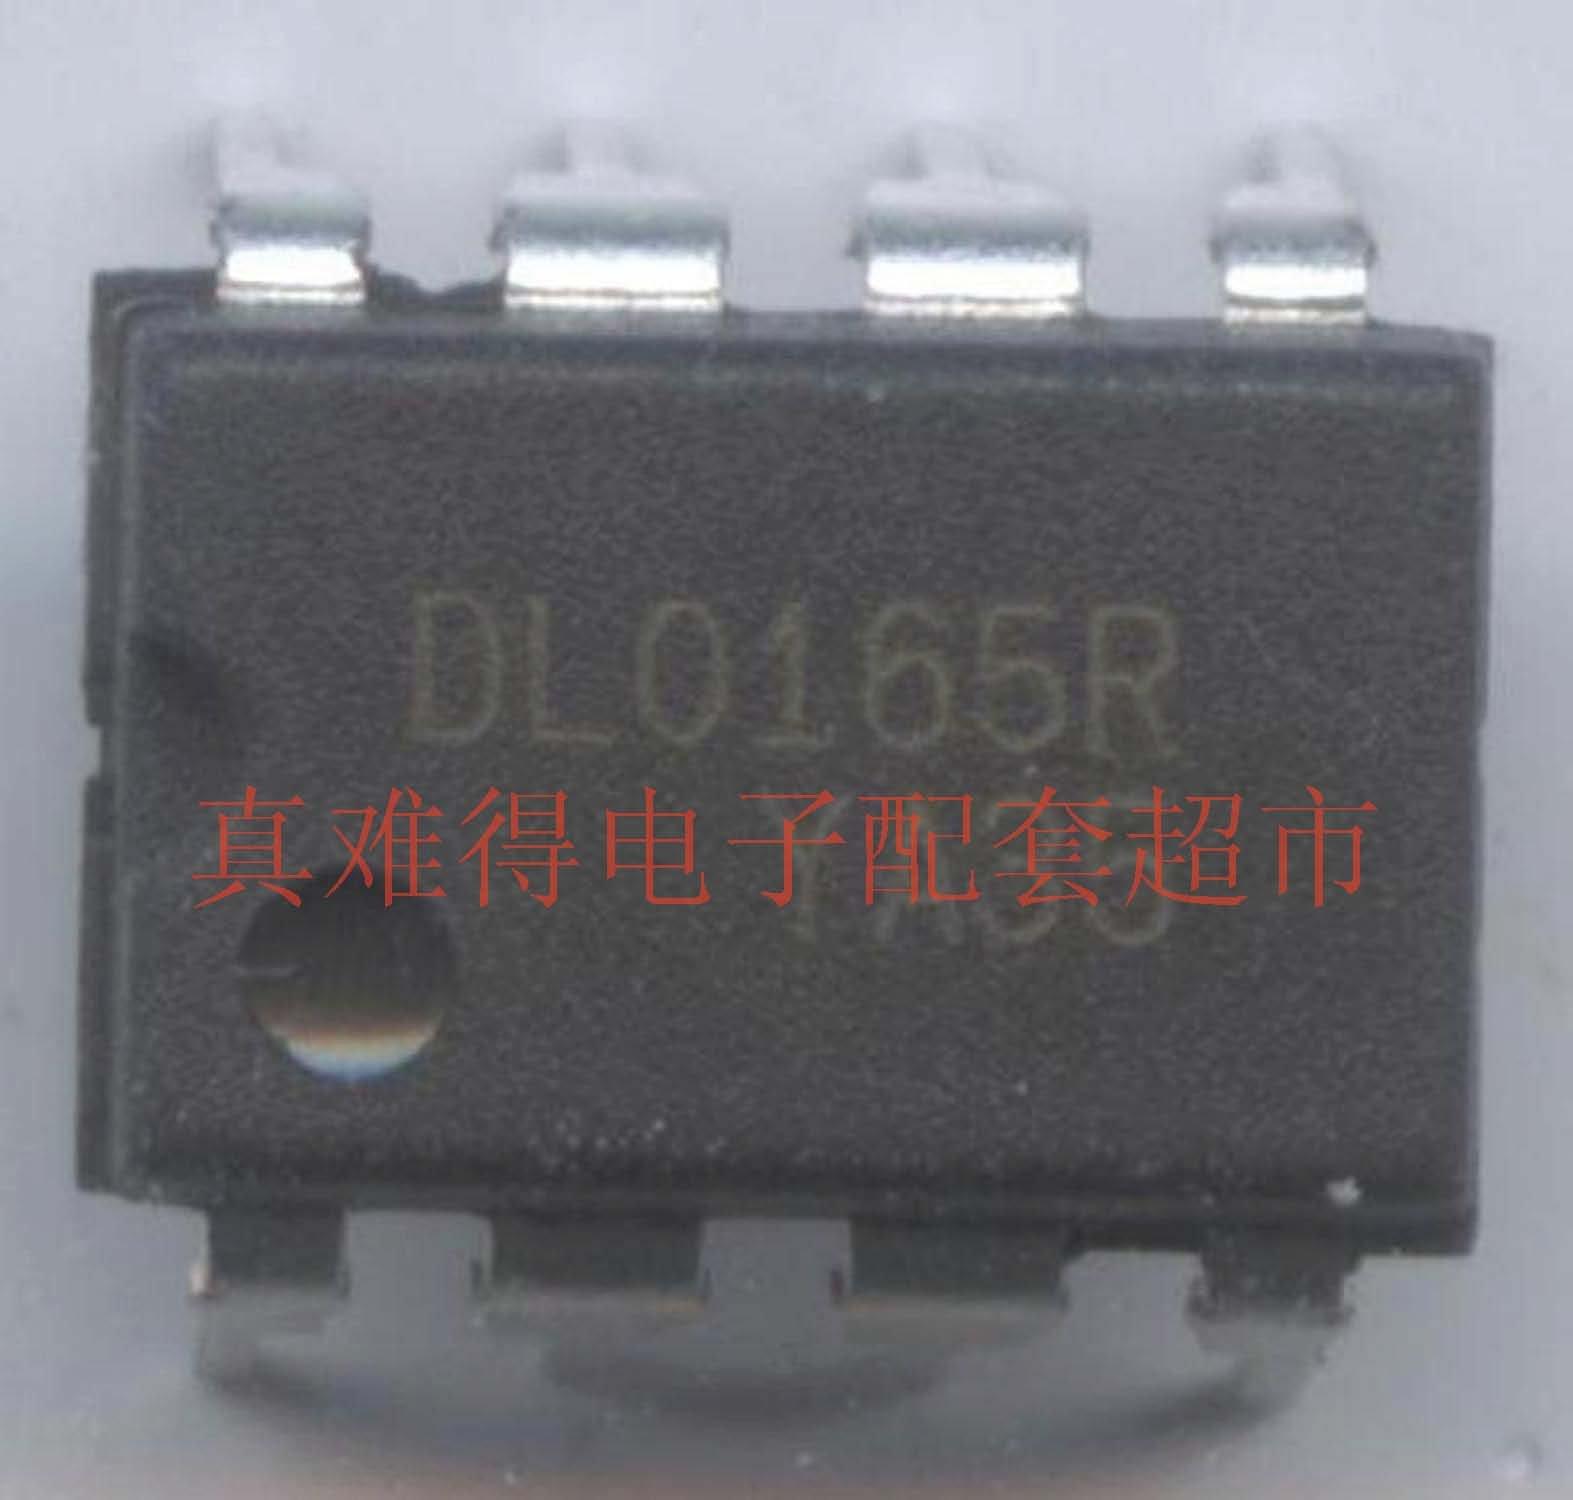 DL0165R, FSDL0165RN Green Mode Fairchild Power Switch(China (Mainland))